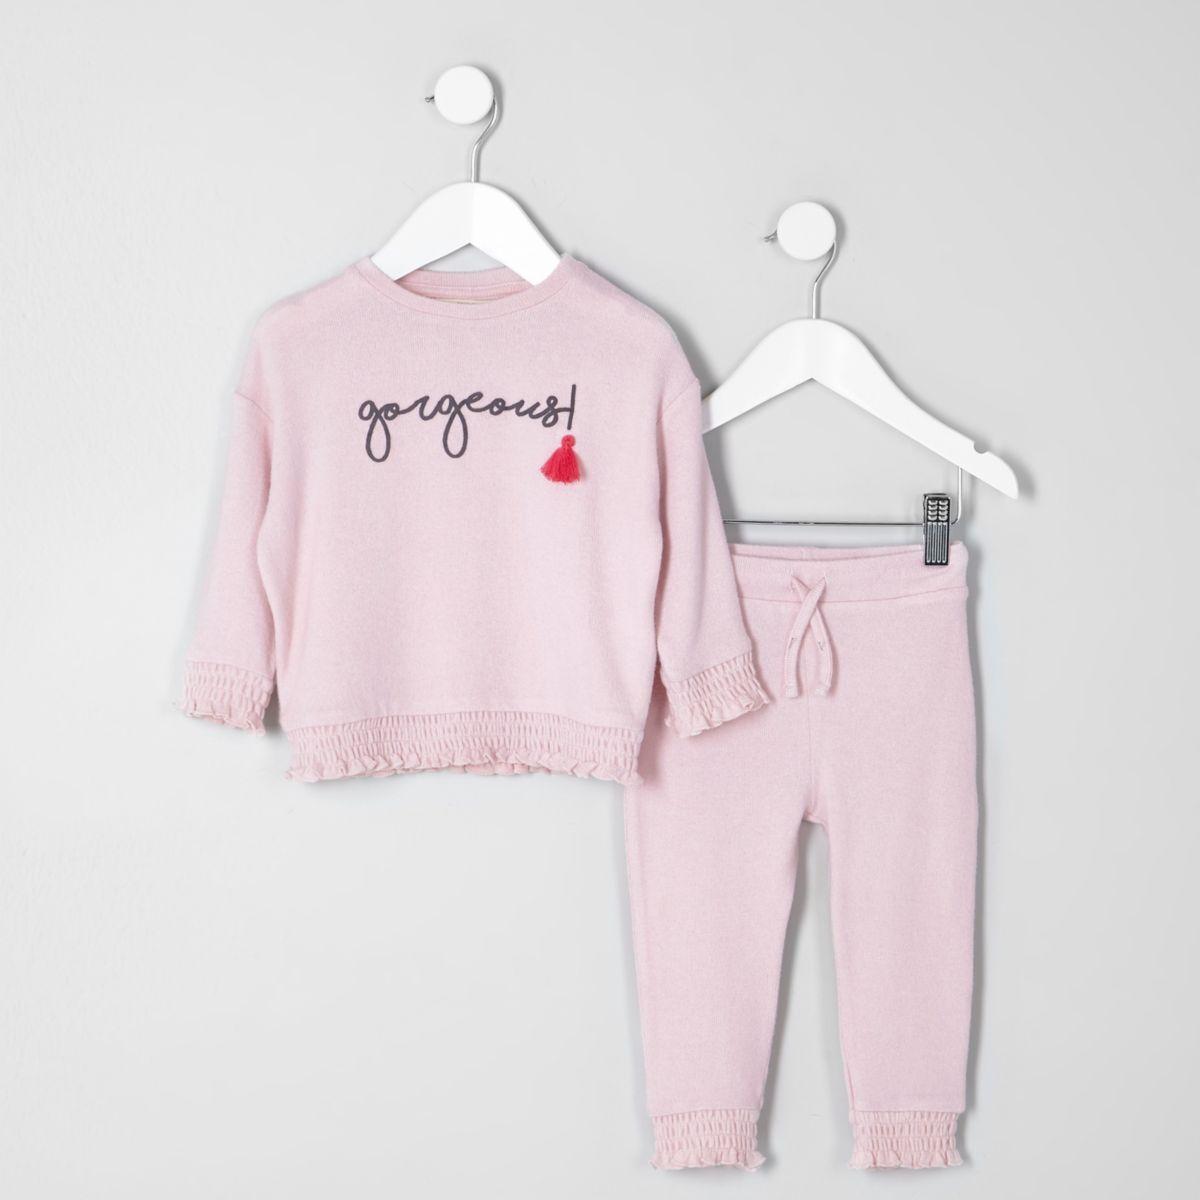 Mini girls 'gorgeous' tassel jumper outfit